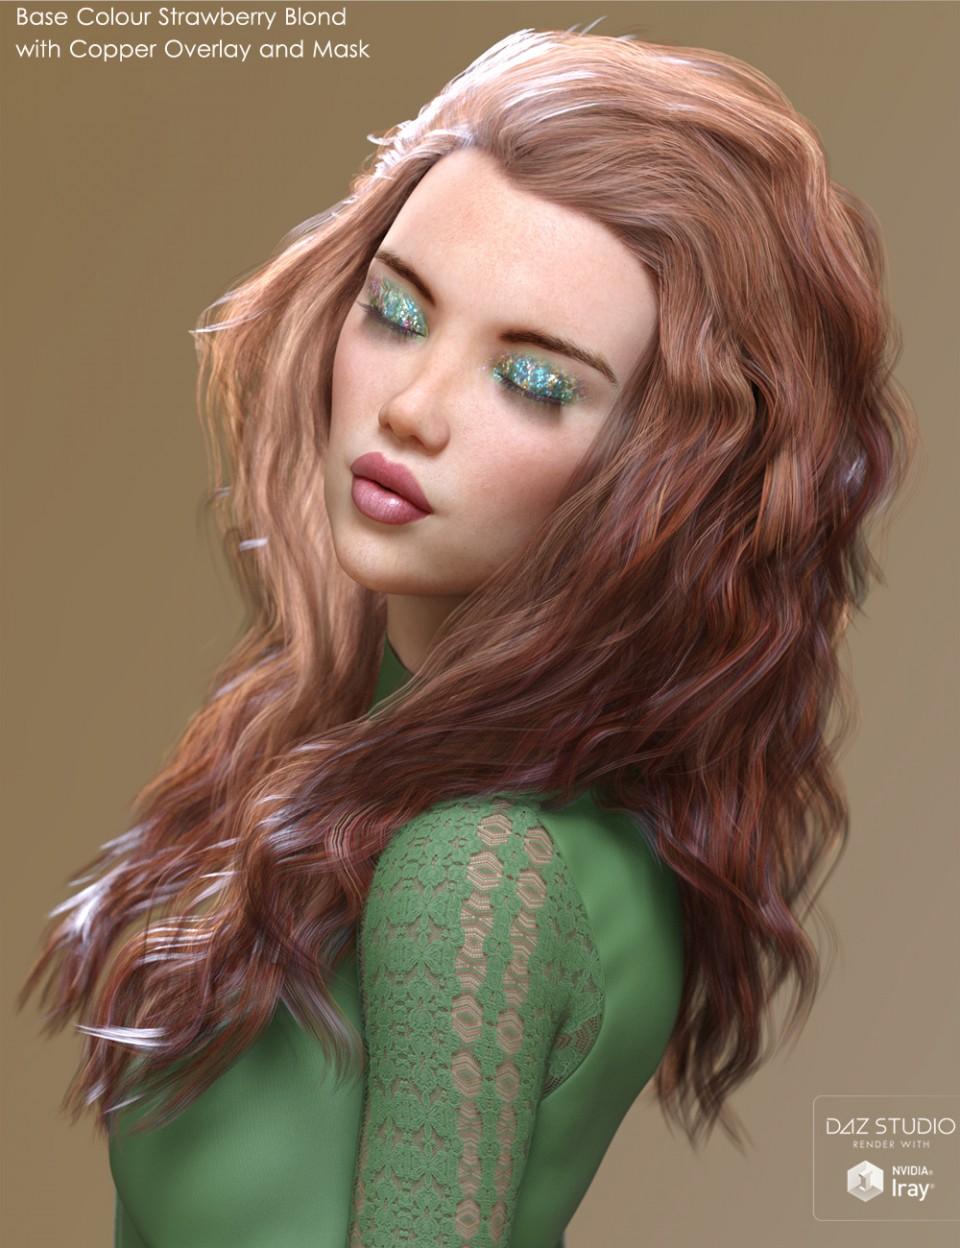 Alchemy for Backlight Hair Shaders for Iray_DAZ3D下载站